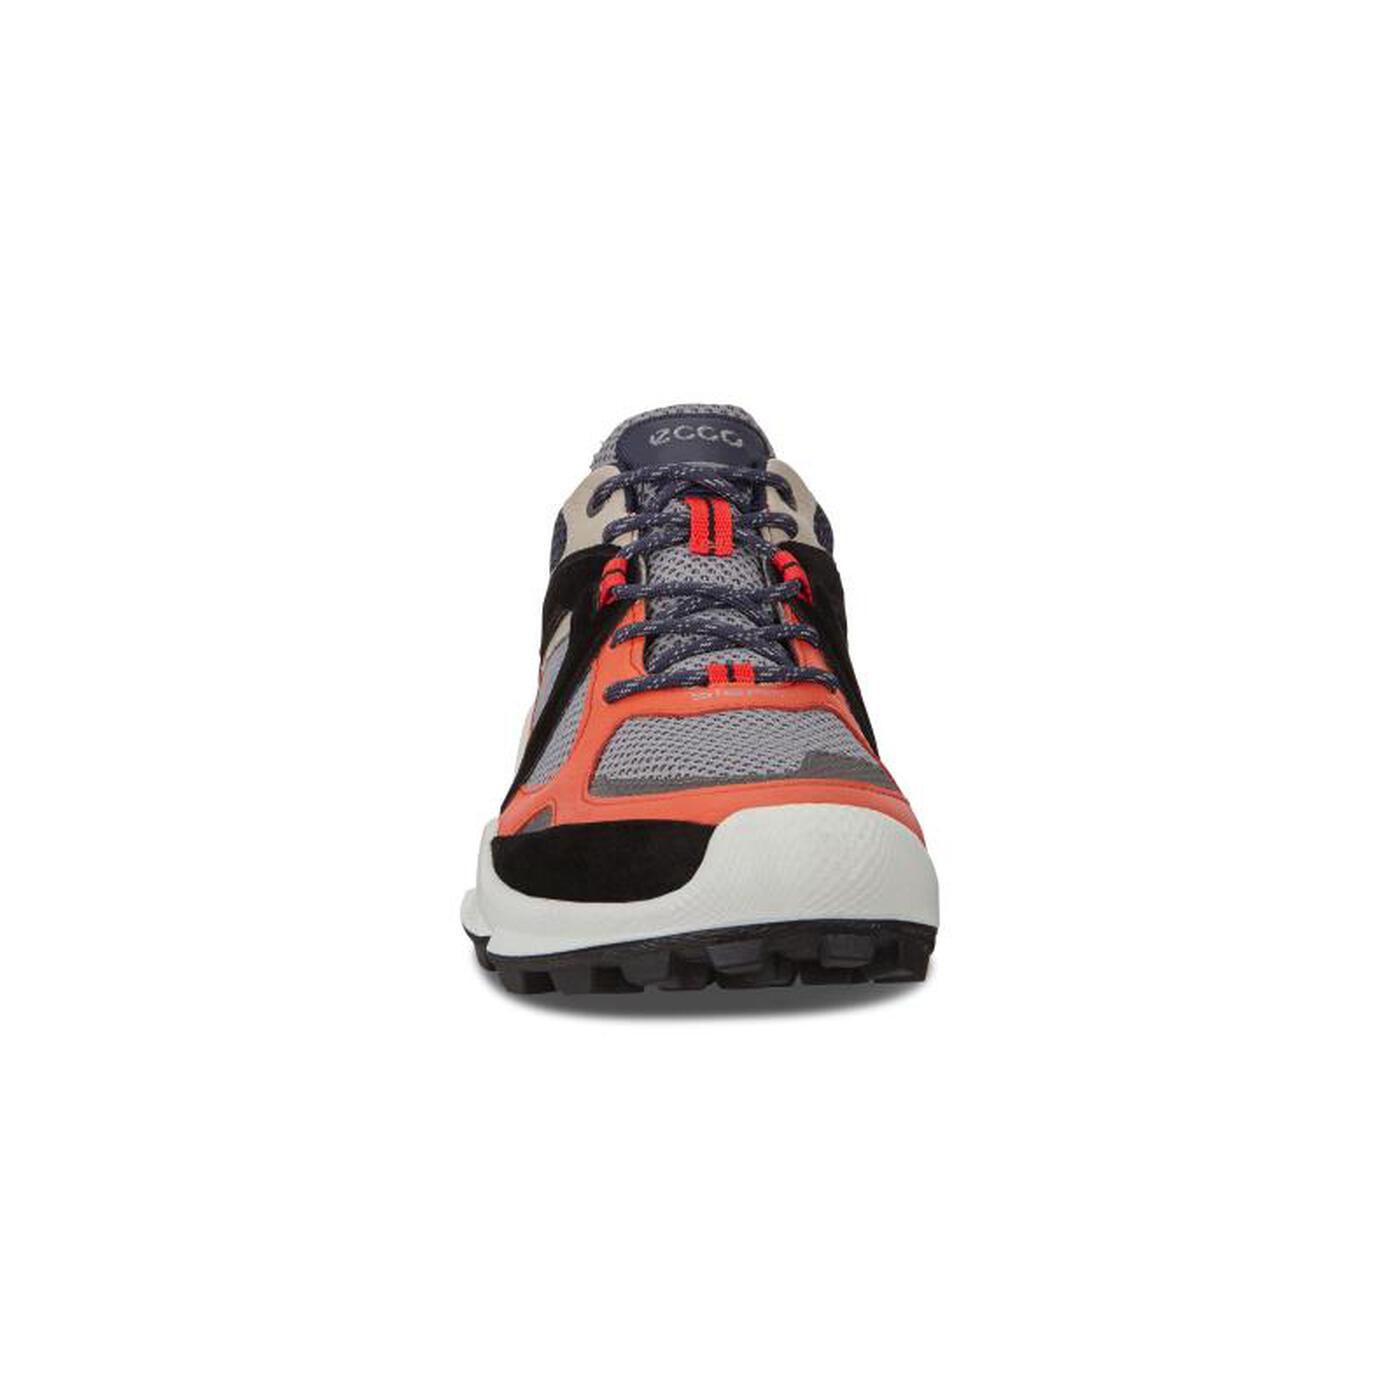 ECCO Biom C-Trail Mens Low Shoes